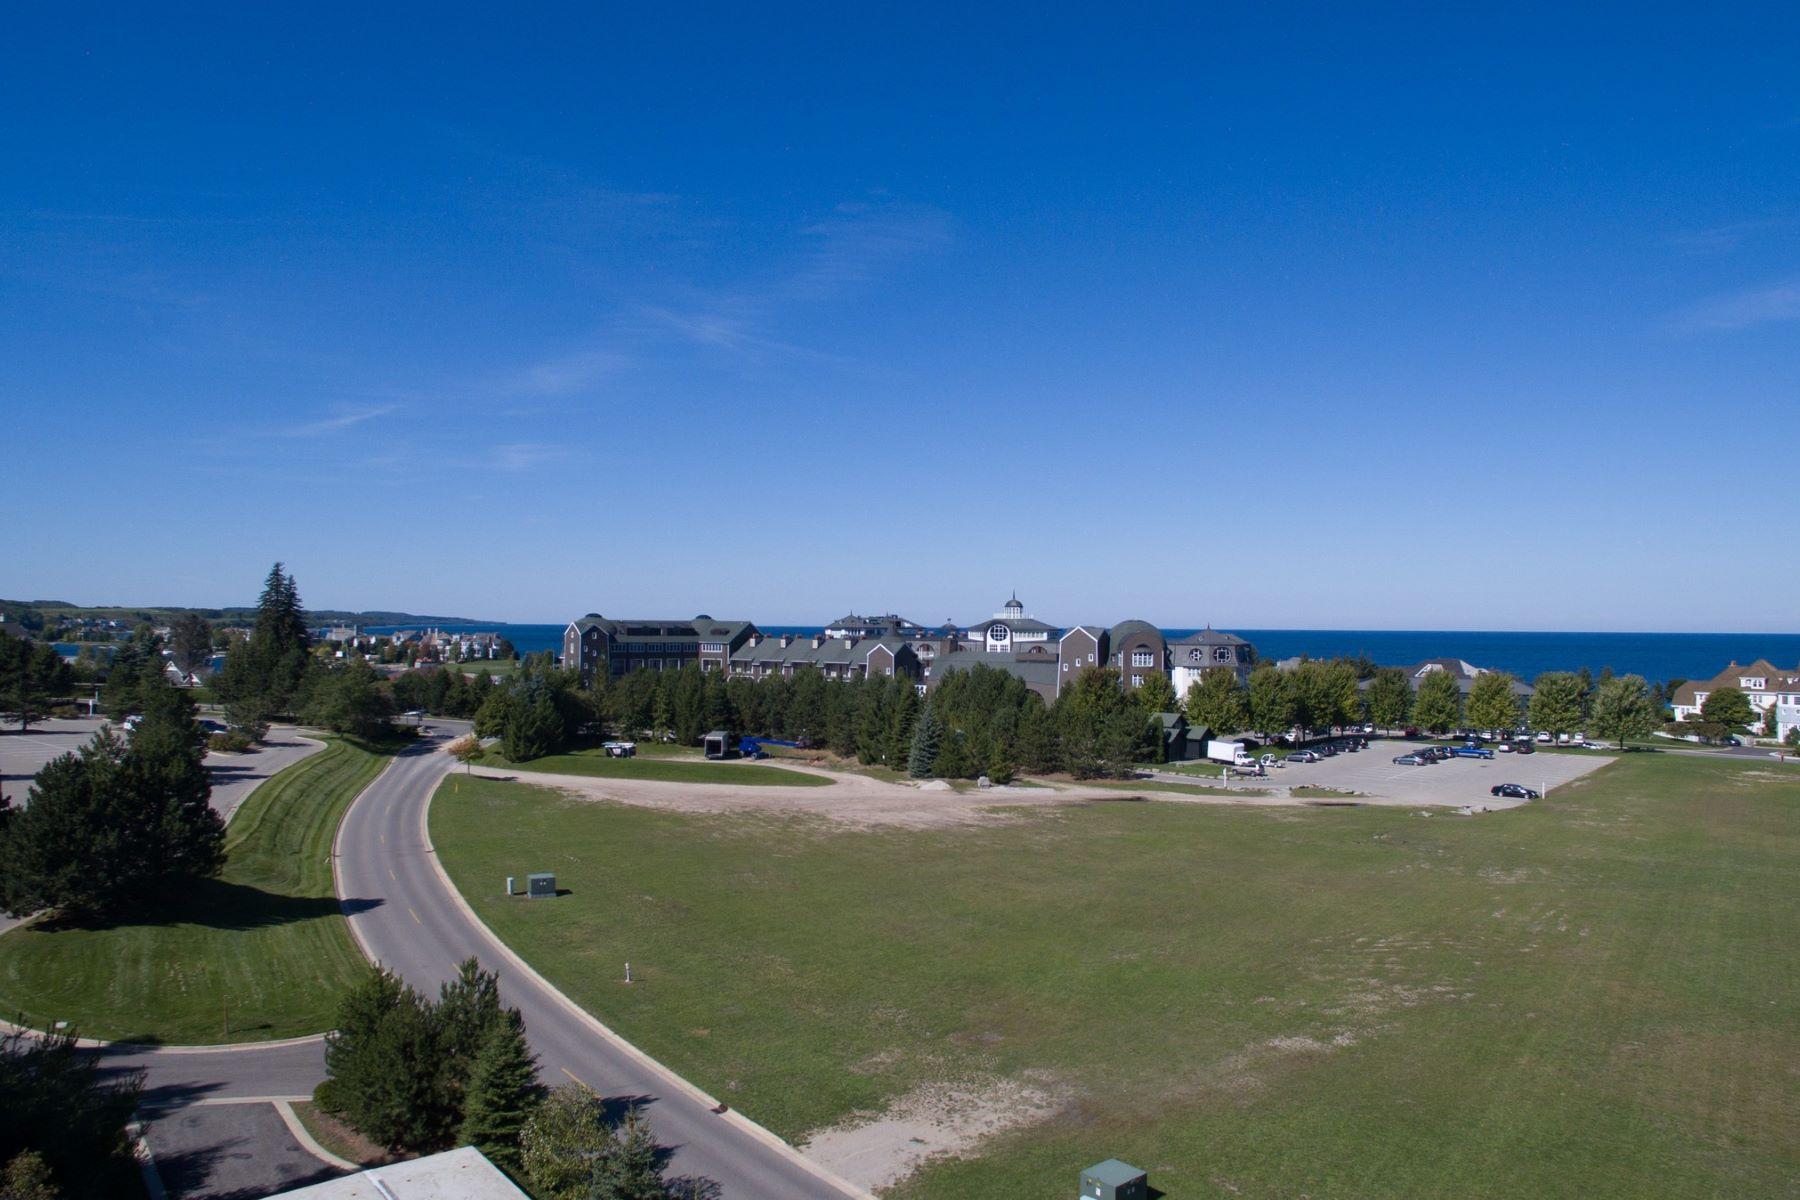 Land for Sale at Unit 11, The Ridge TBD Cliffs Drive, Unit 11, The Ridge Bay Harbor, Michigan 49770 United States